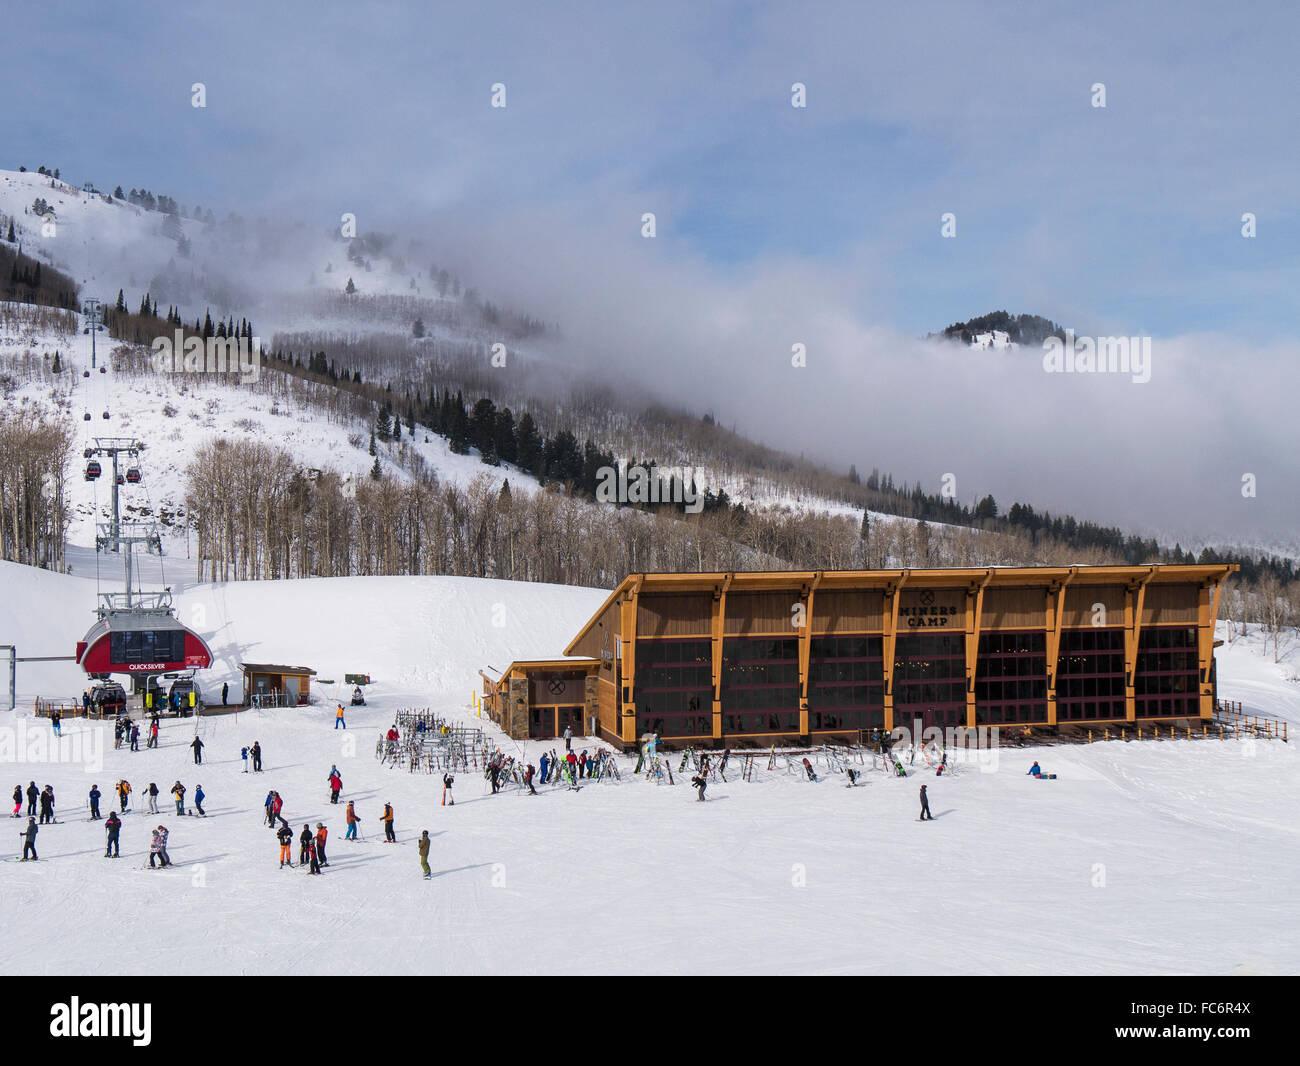 Miners Camp lodge and restaurant, Park City Mountain Resort, Utah. - Stock Image